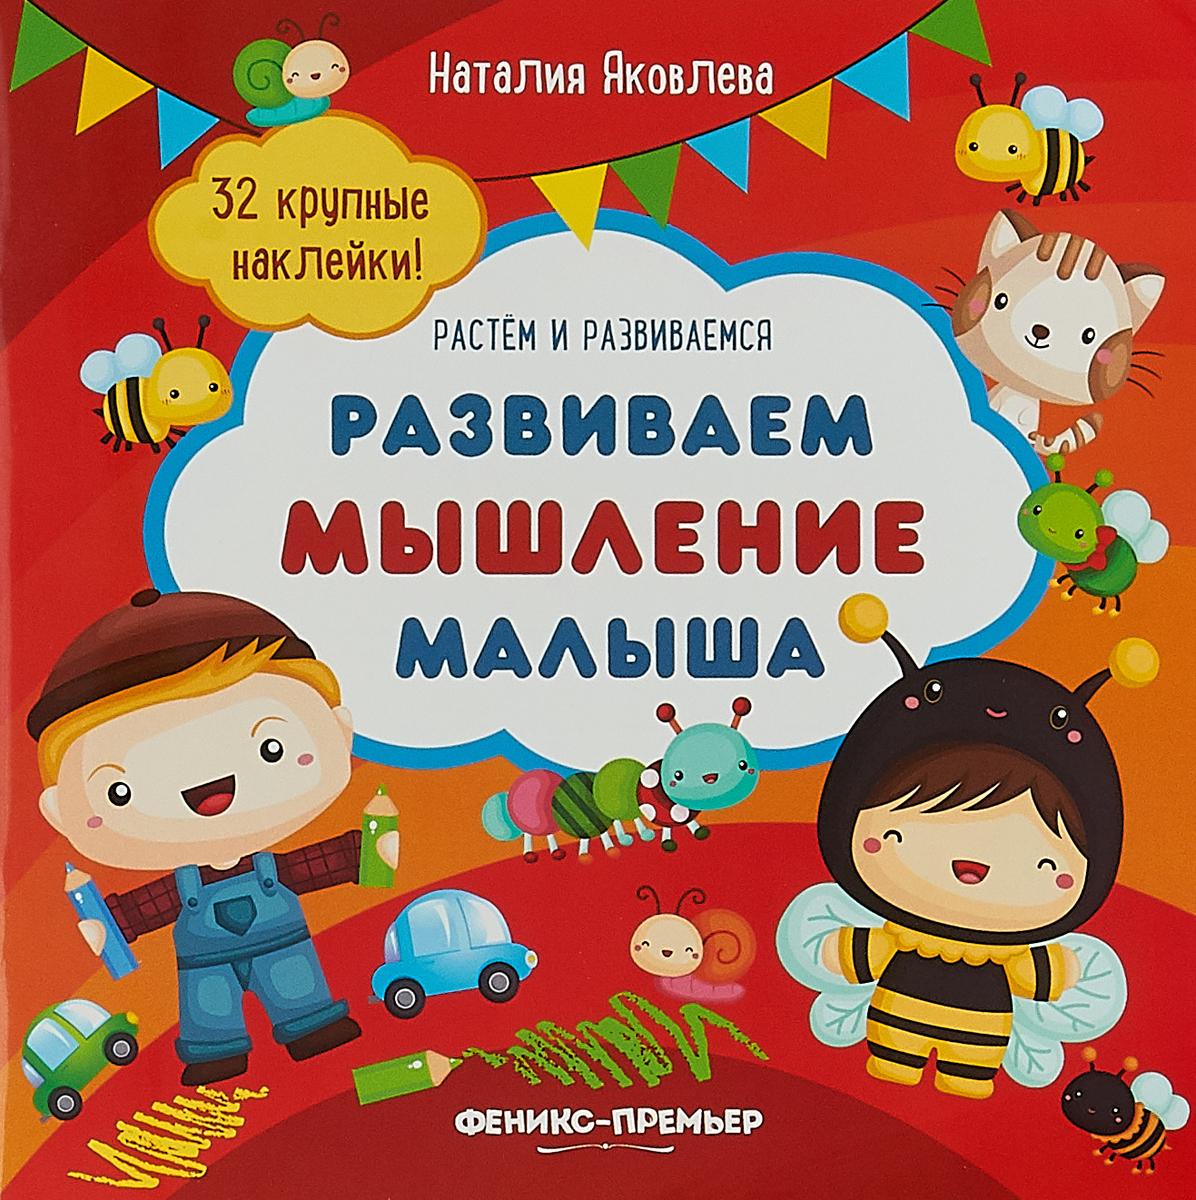 Фото - Наталия Яковлева Развиваем мышление малыша. Книжка с наклейками яковлева н развиваем мышление малыша